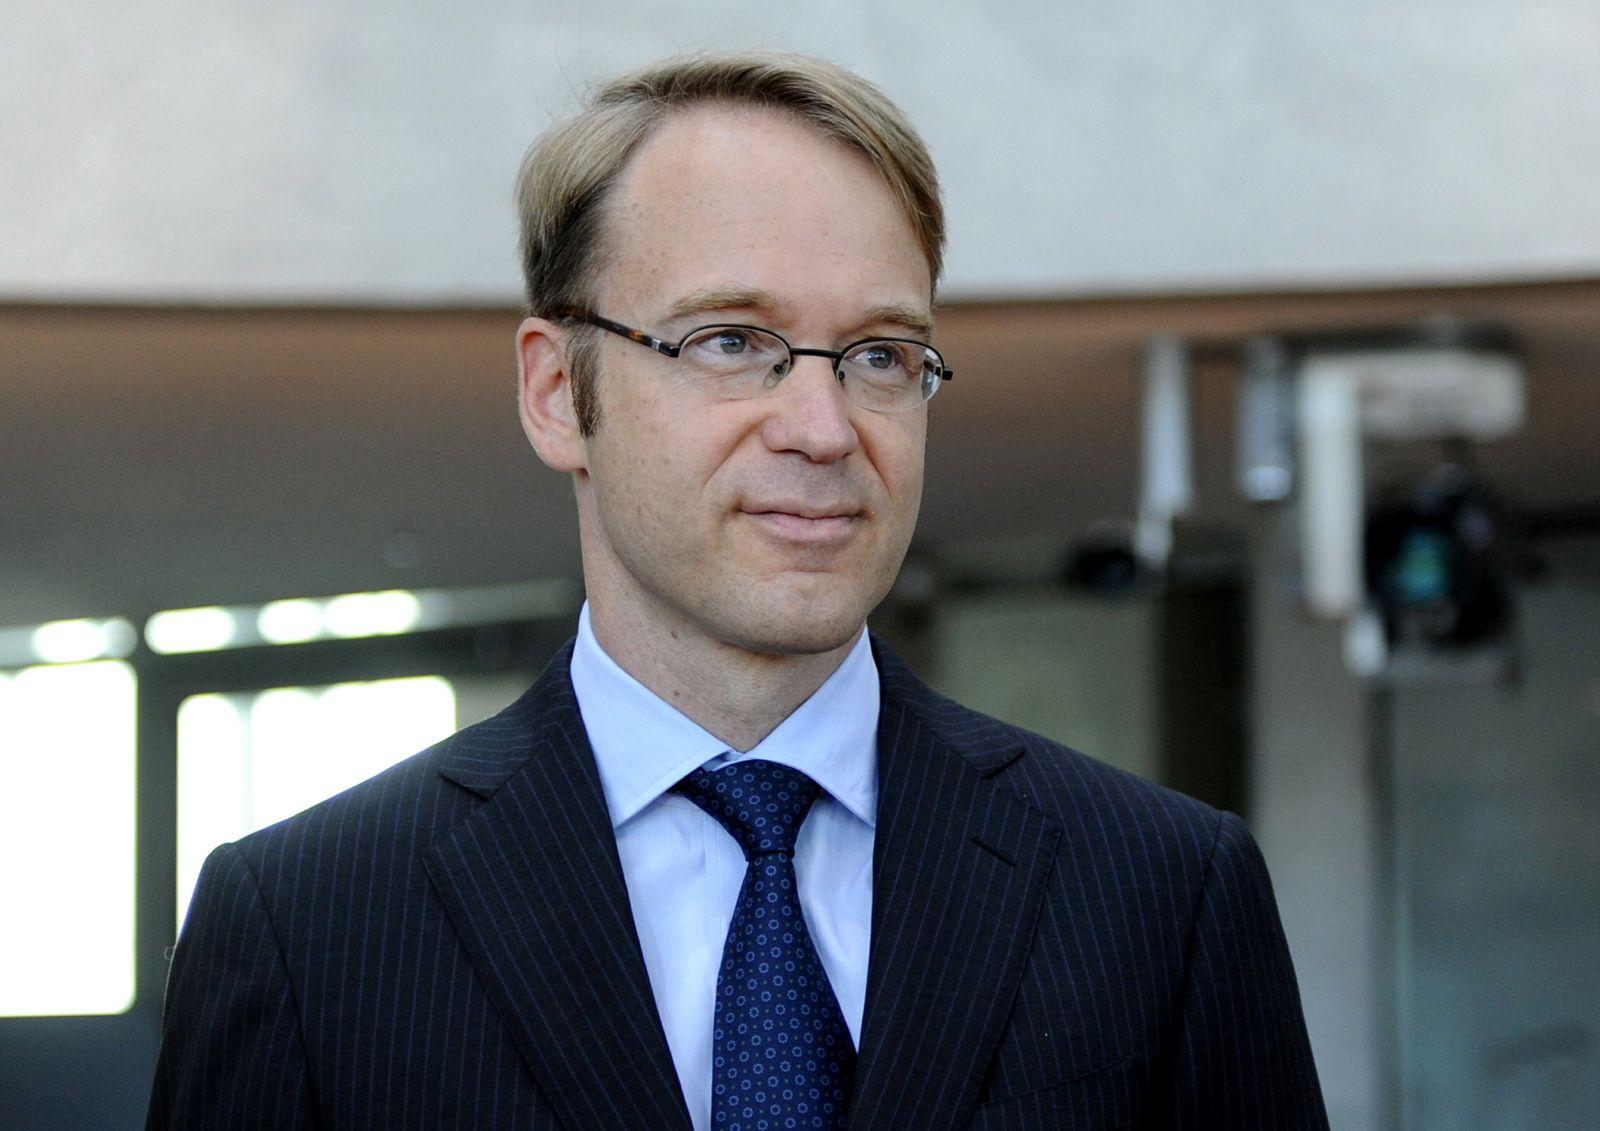 NICHT VERWENDEN Jens Weidmann